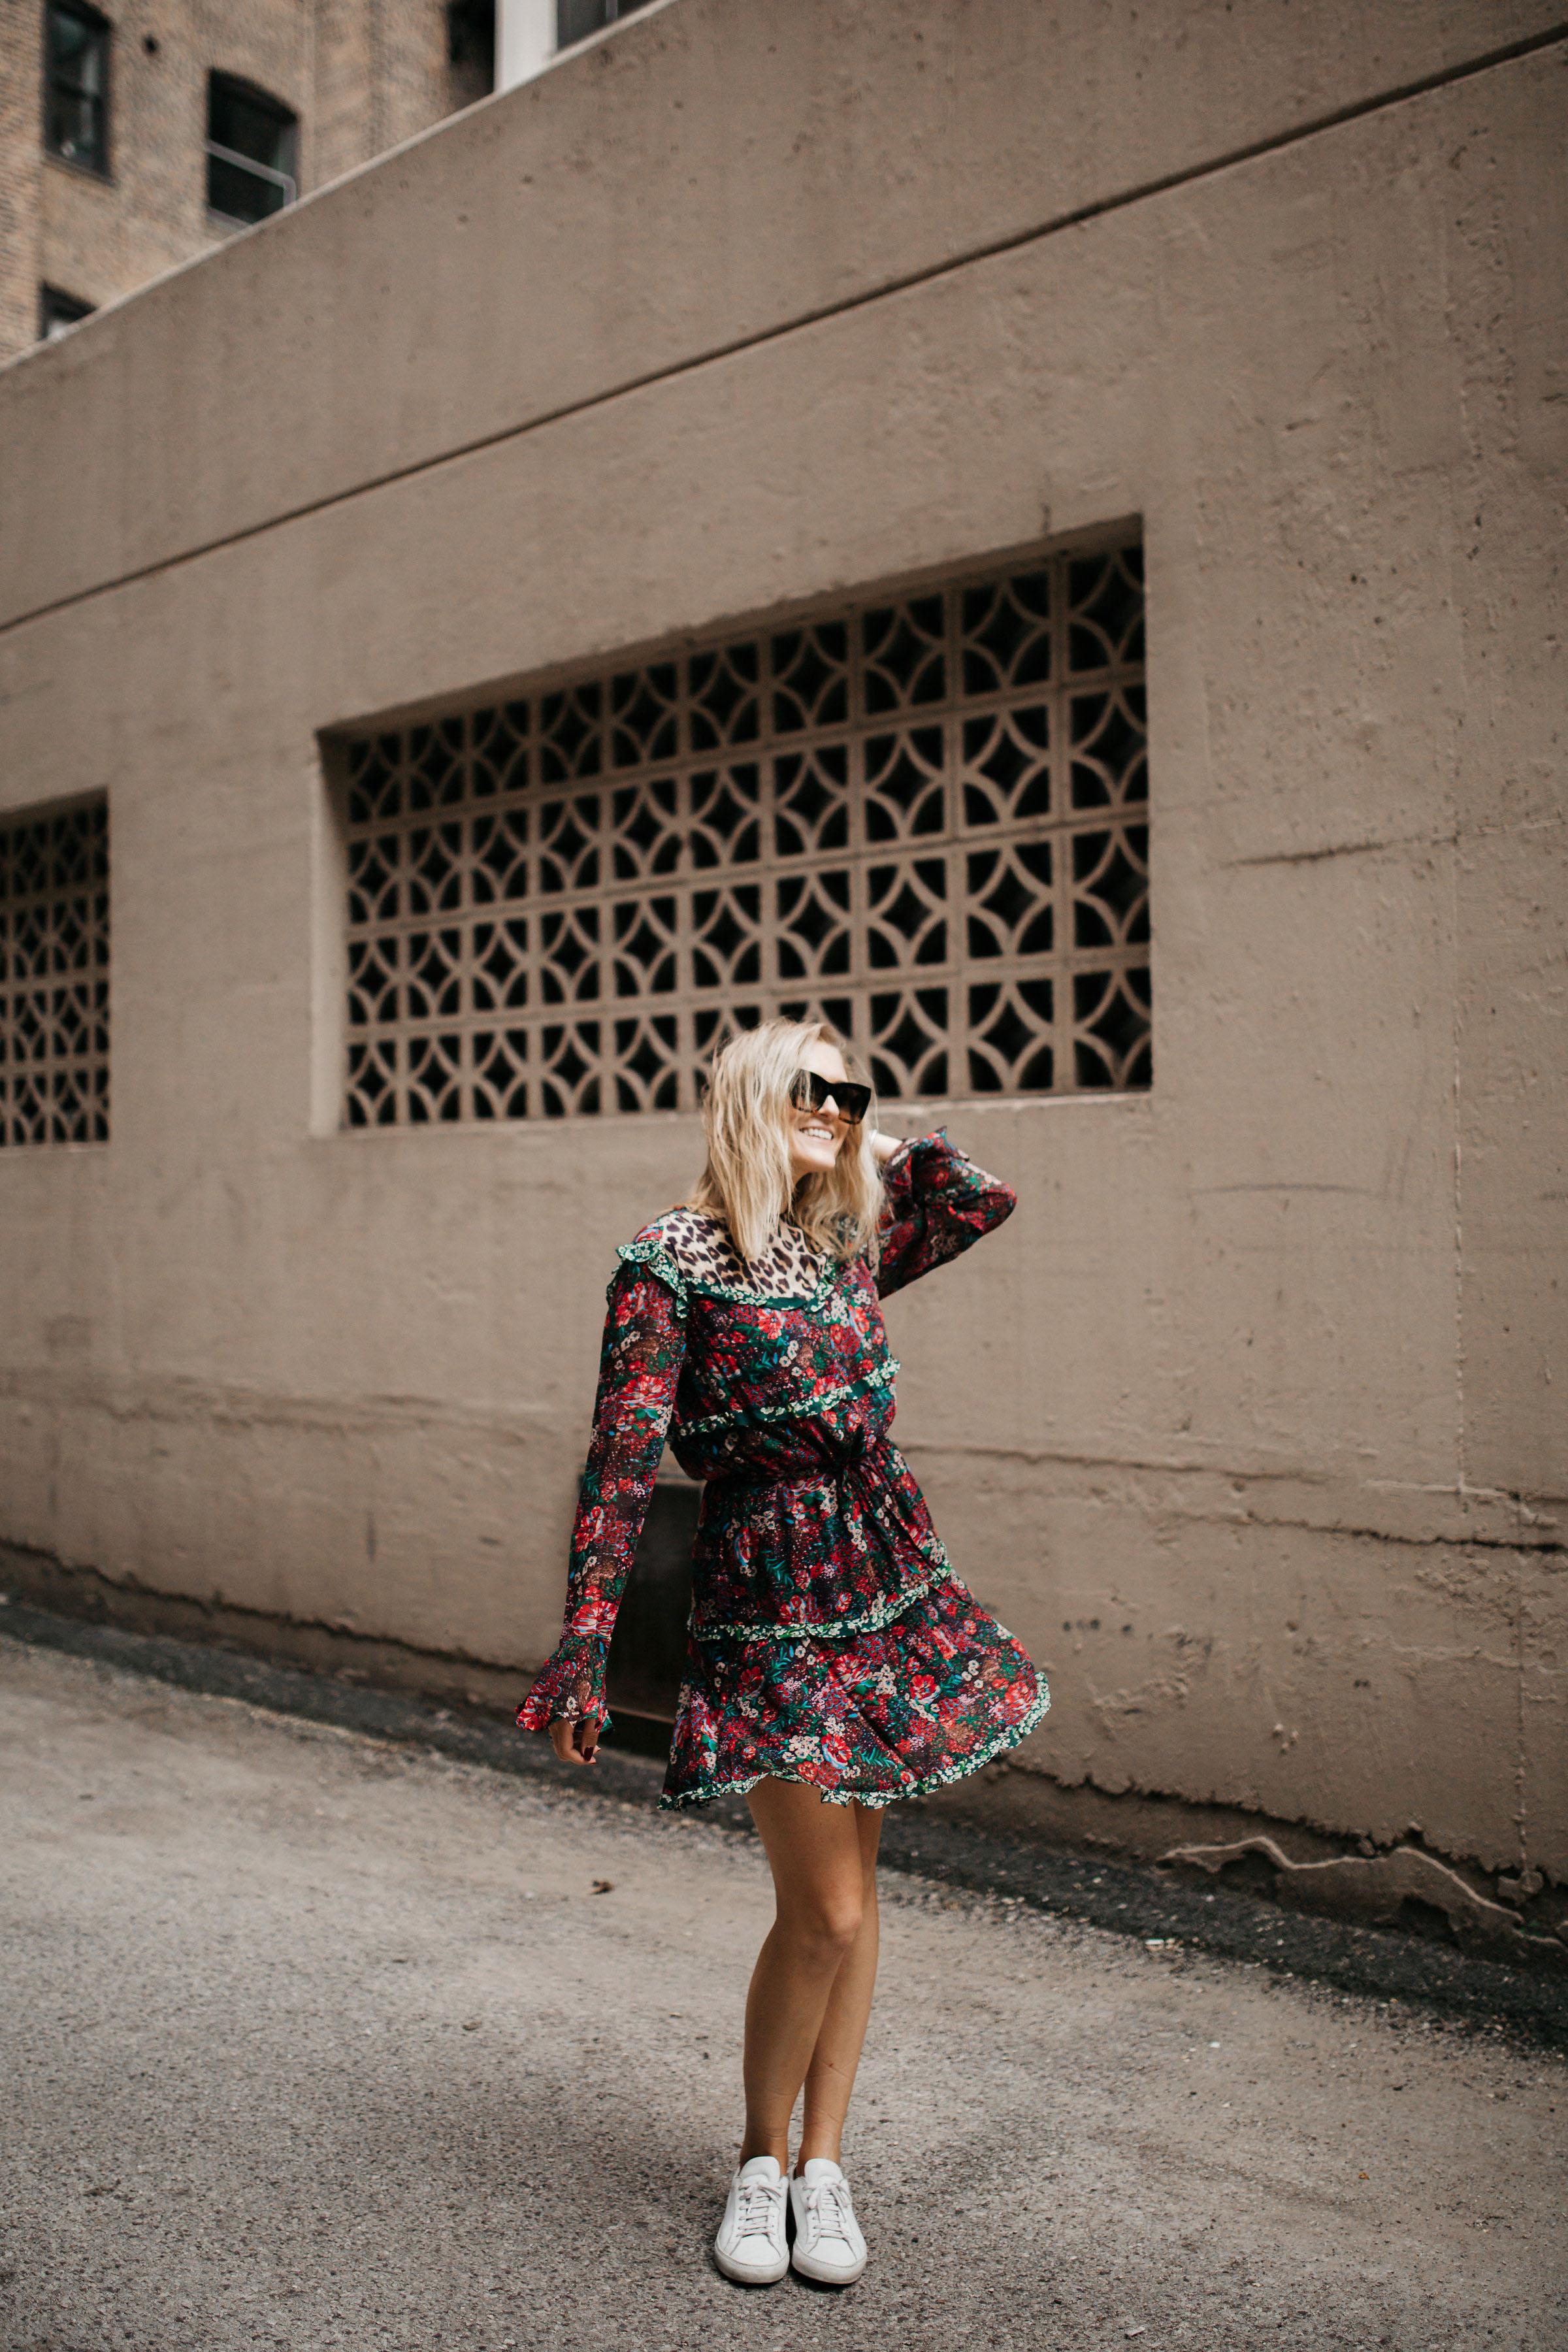 dancing-in-scotch-and-soda-dress